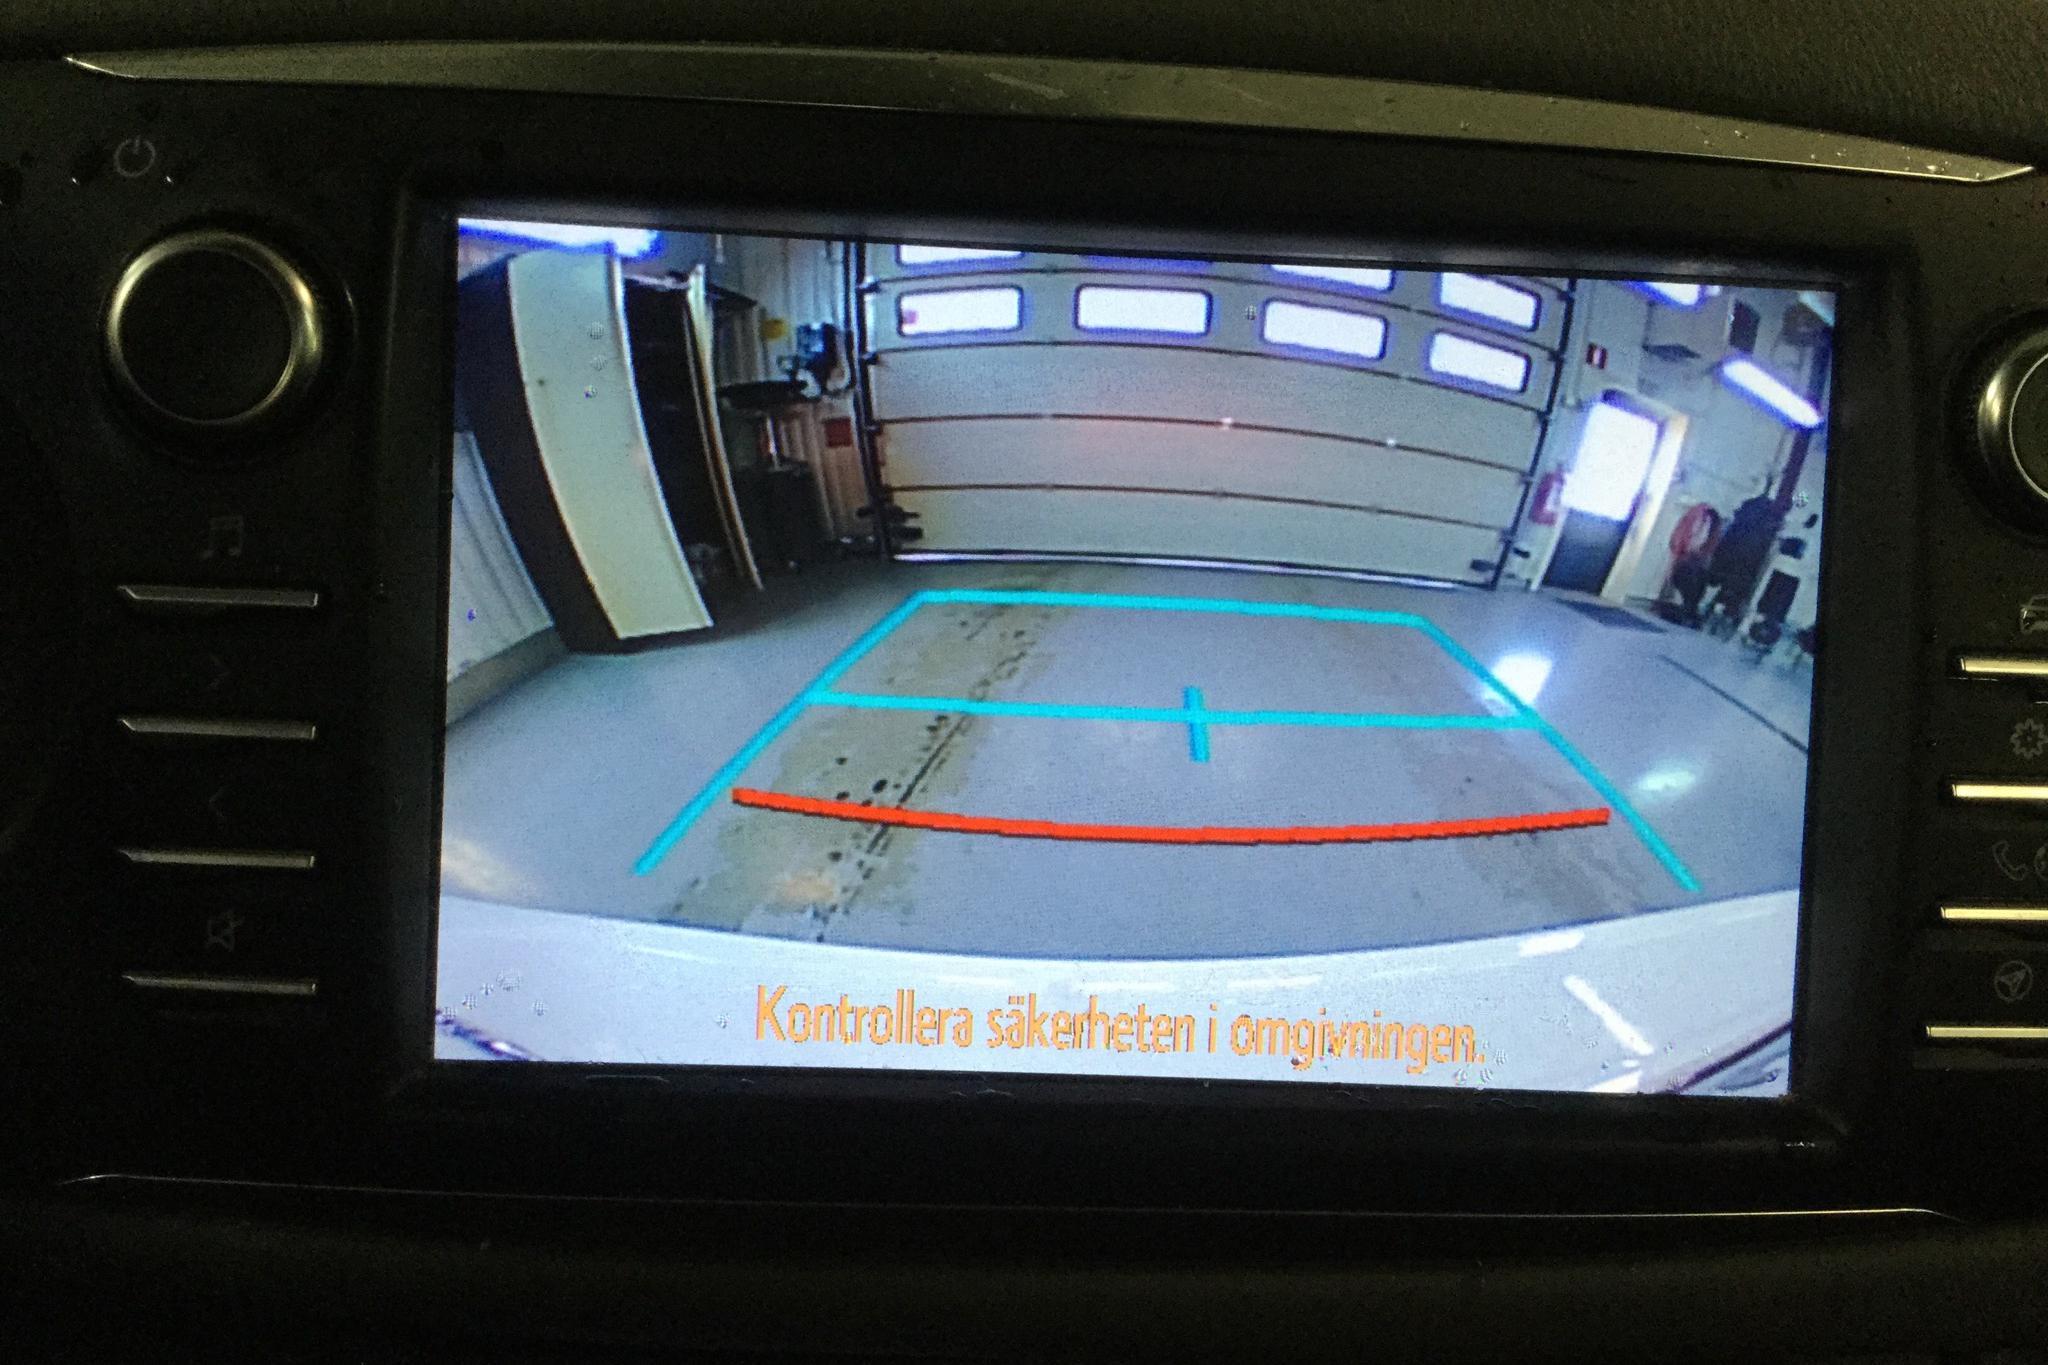 Toyota Yaris 1.5 Hybrid 5dr (101hk)2018 - 0 mil - Automat - vit - 2018